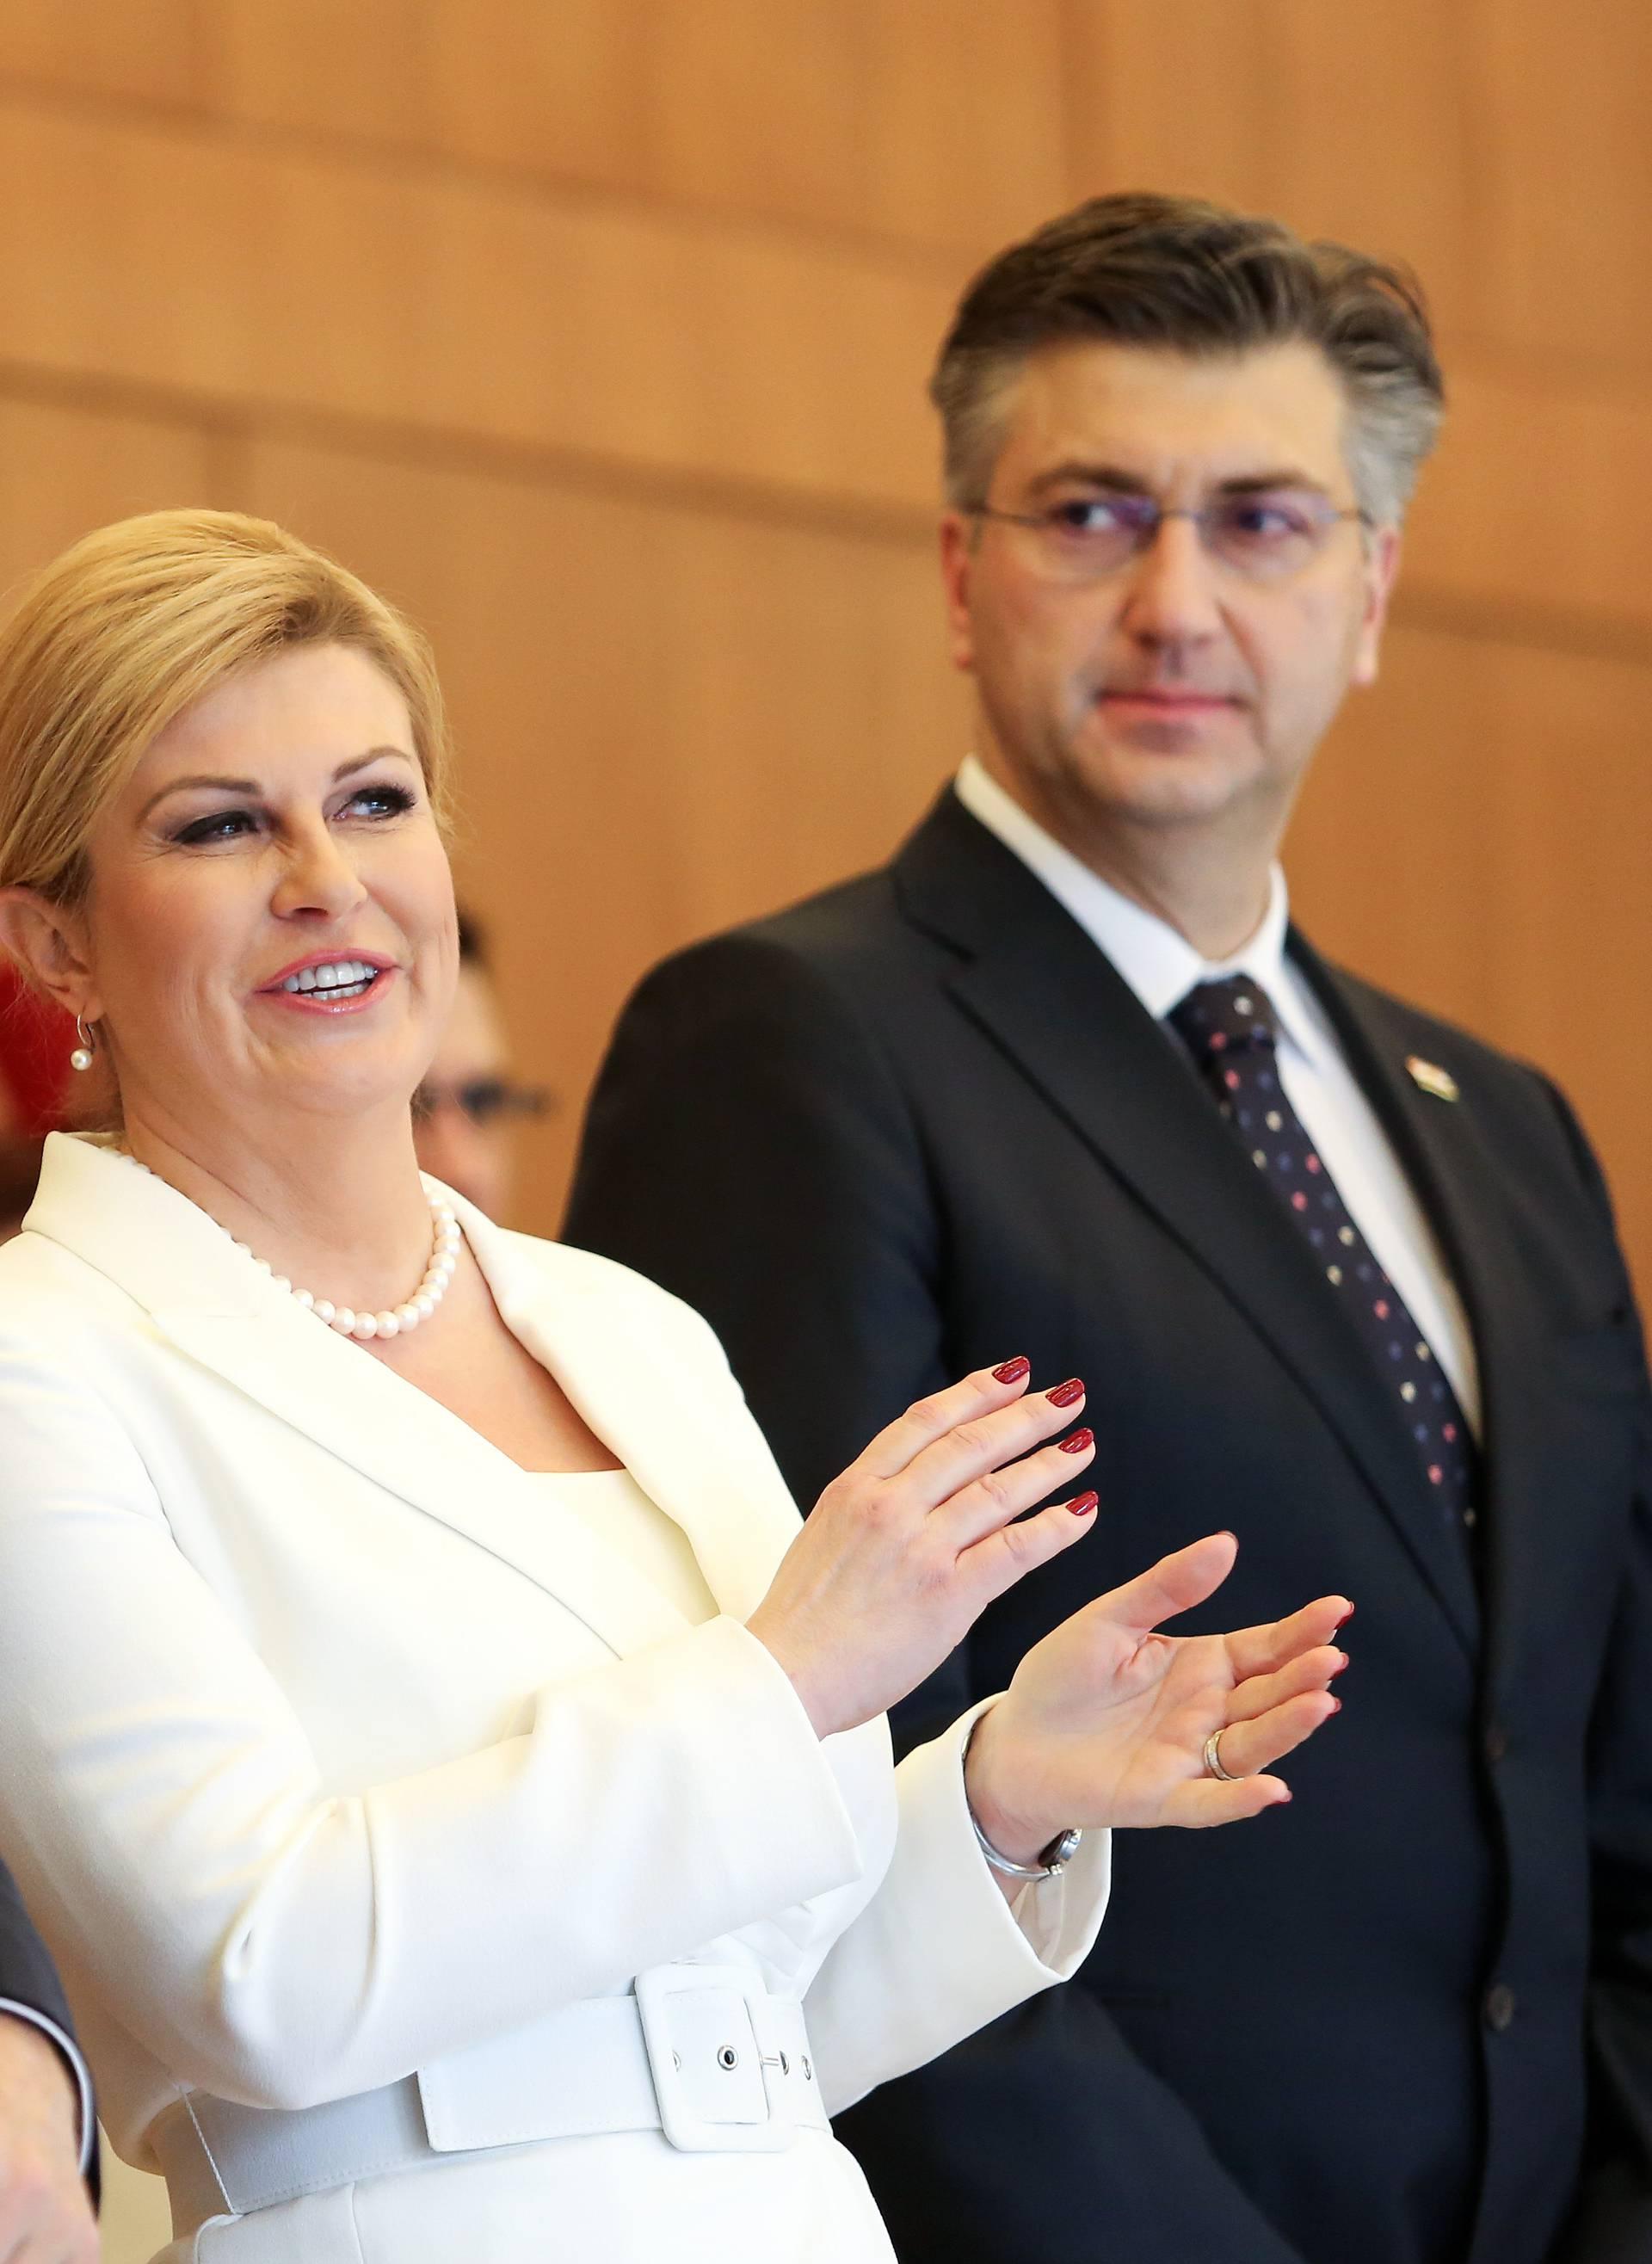 Zagreb: Predsjednica posmrtno odlikovala nadbiskupa zagrebačkog, kardinala Franju Kuharića